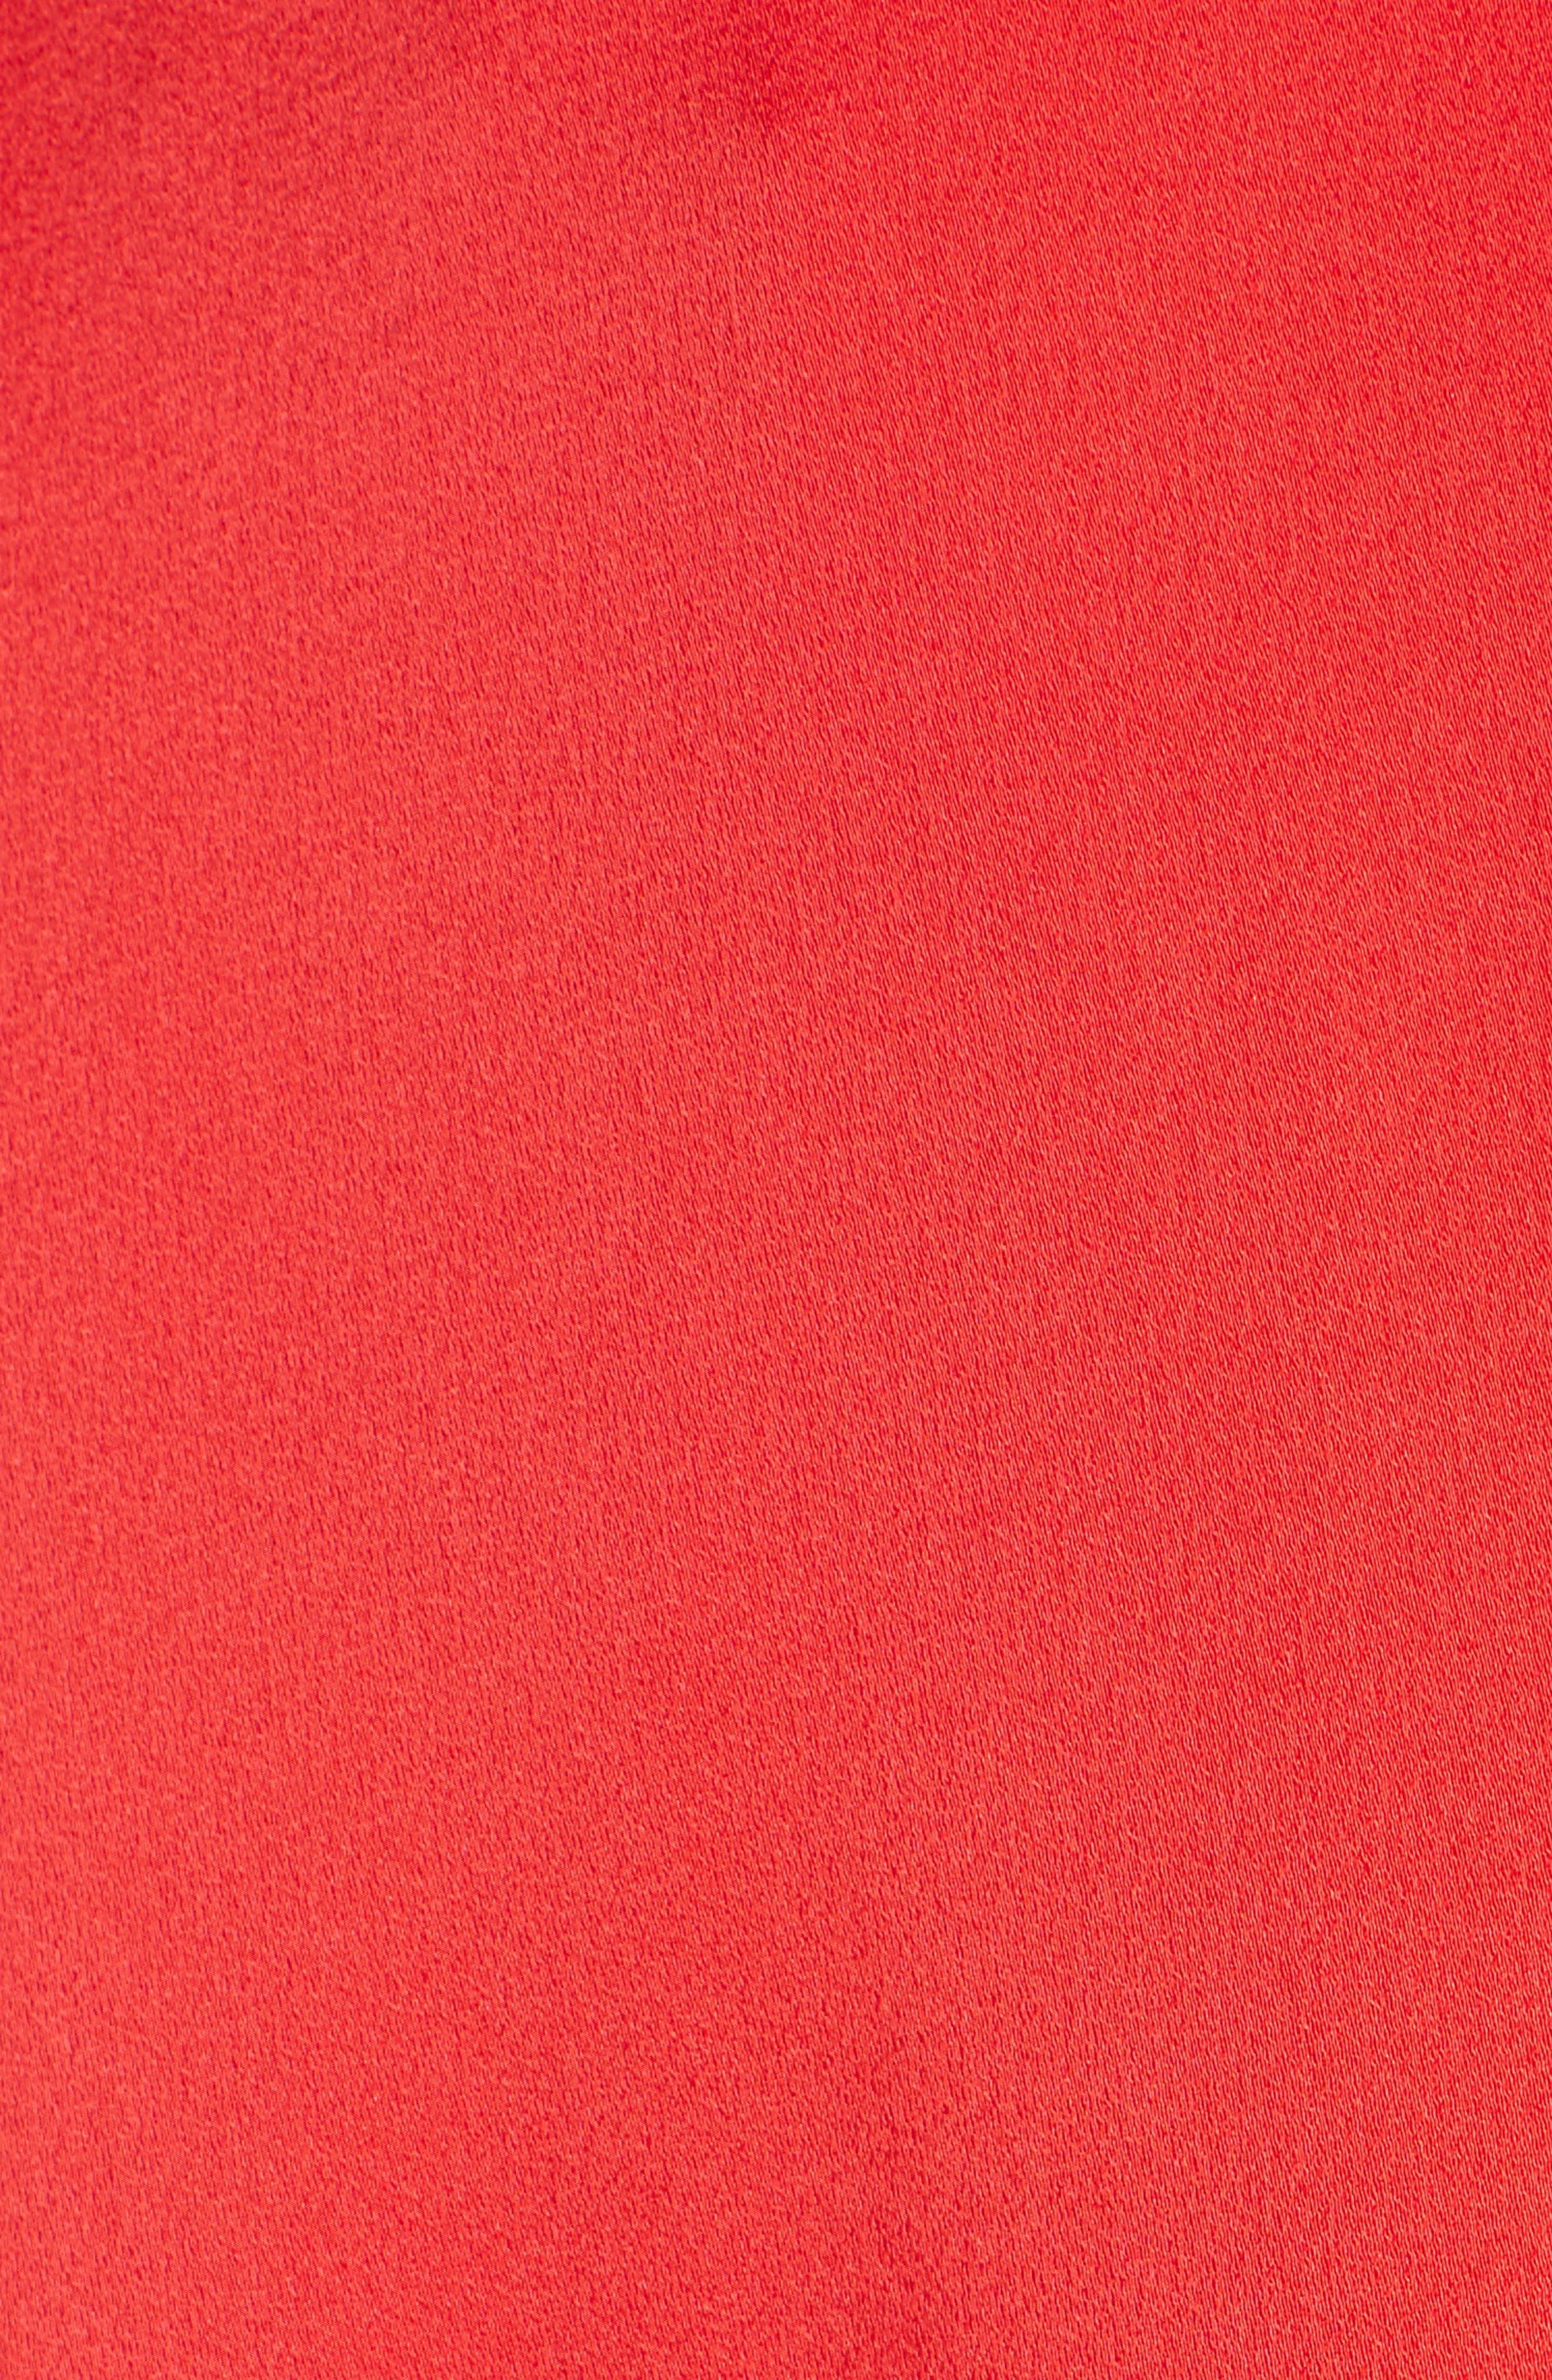 Bell Sleeve Tie Neck Dress,                             Alternate thumbnail 5, color,                             622